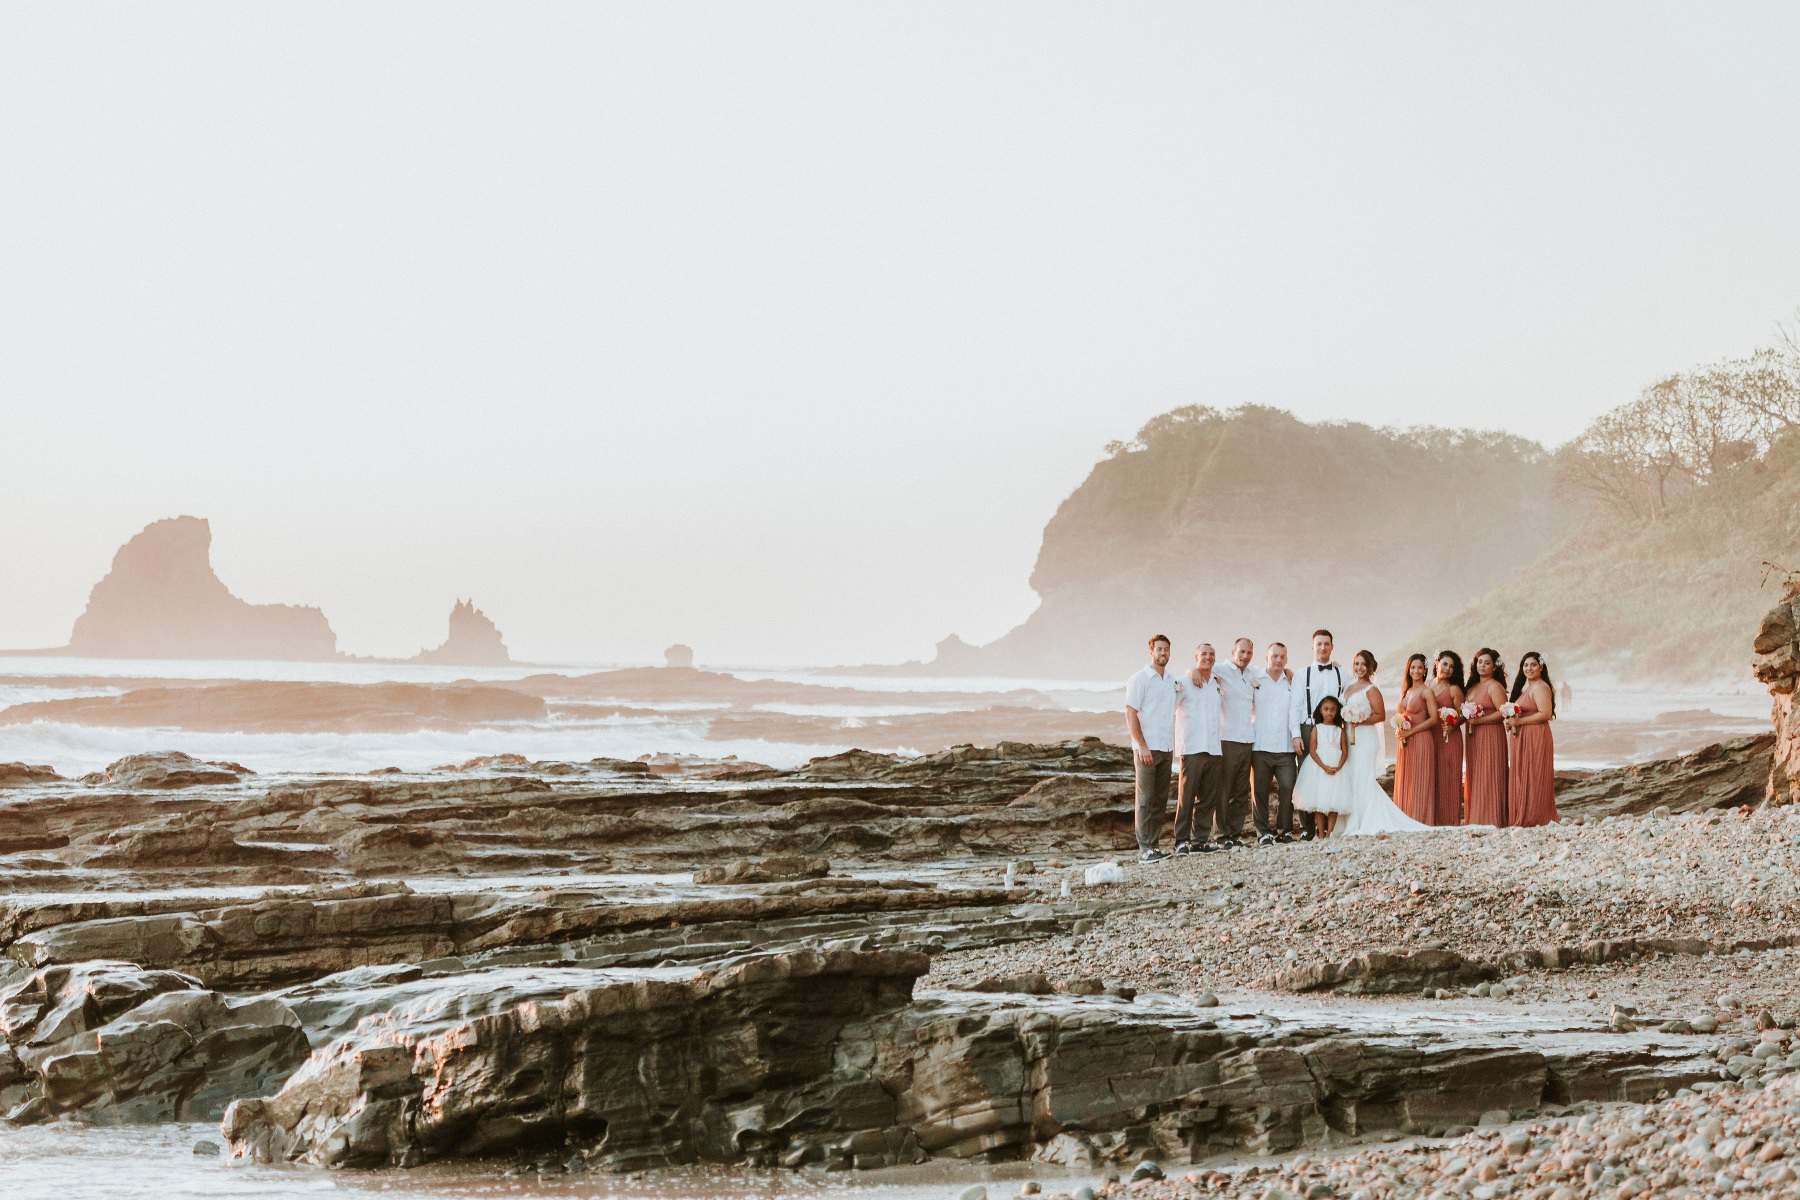 Destination wedding photographer  Maderas Beach Nicaragua. Group photo